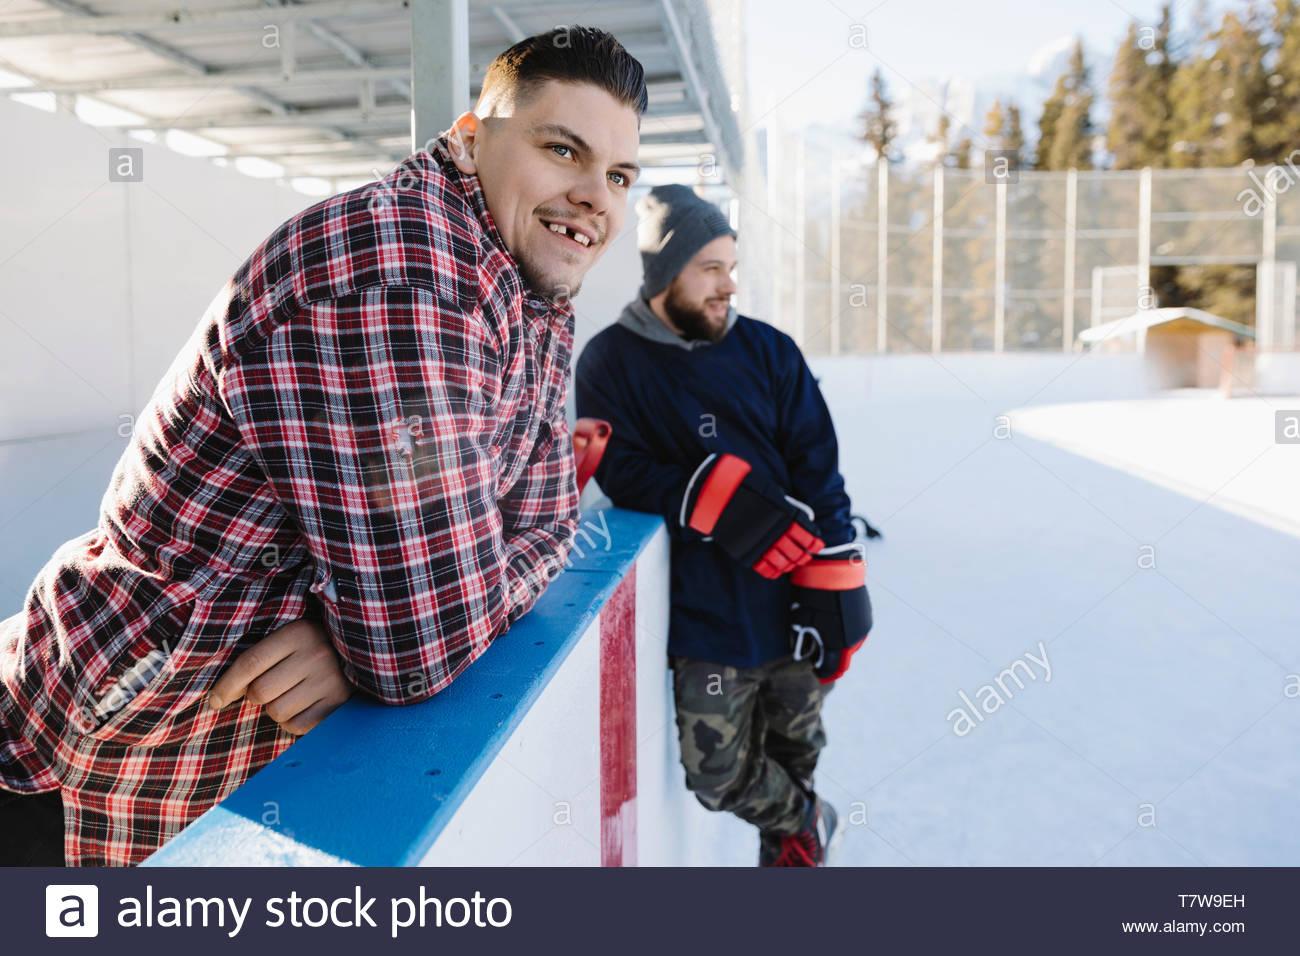 Smiling Men playing hockey sur glace en plein air Photo Stock